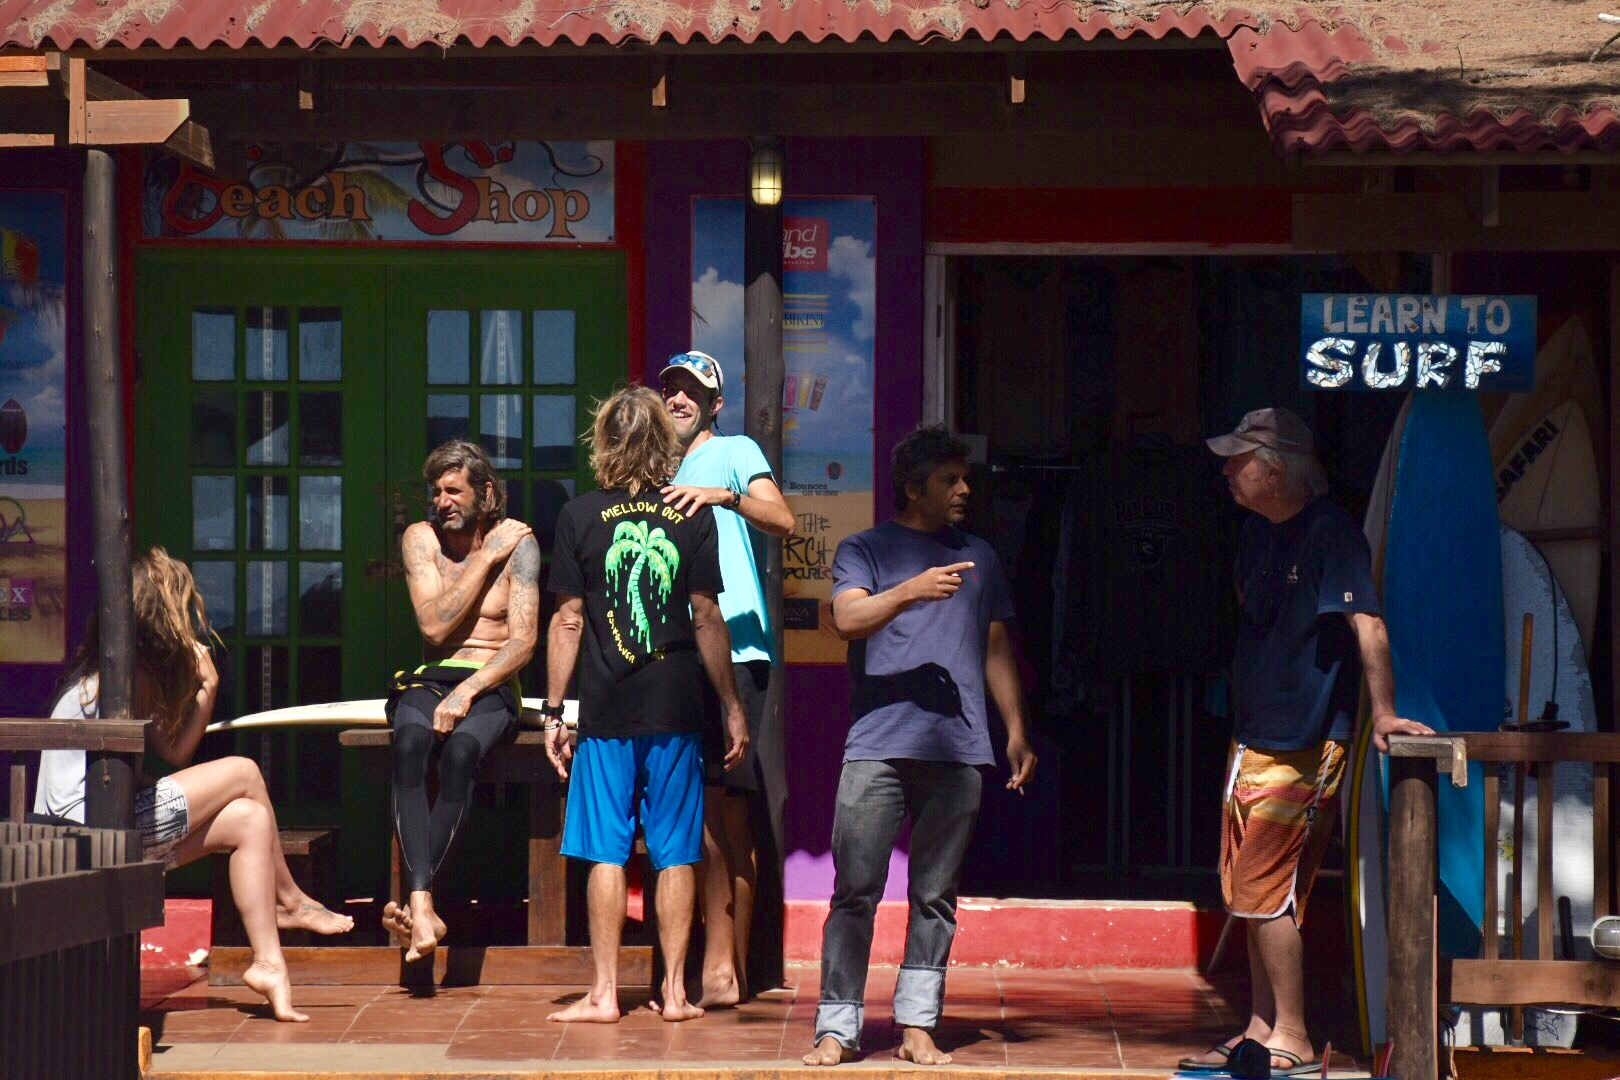 Surfing dudes in Ponta de Ouro, Mozambique, September 2017